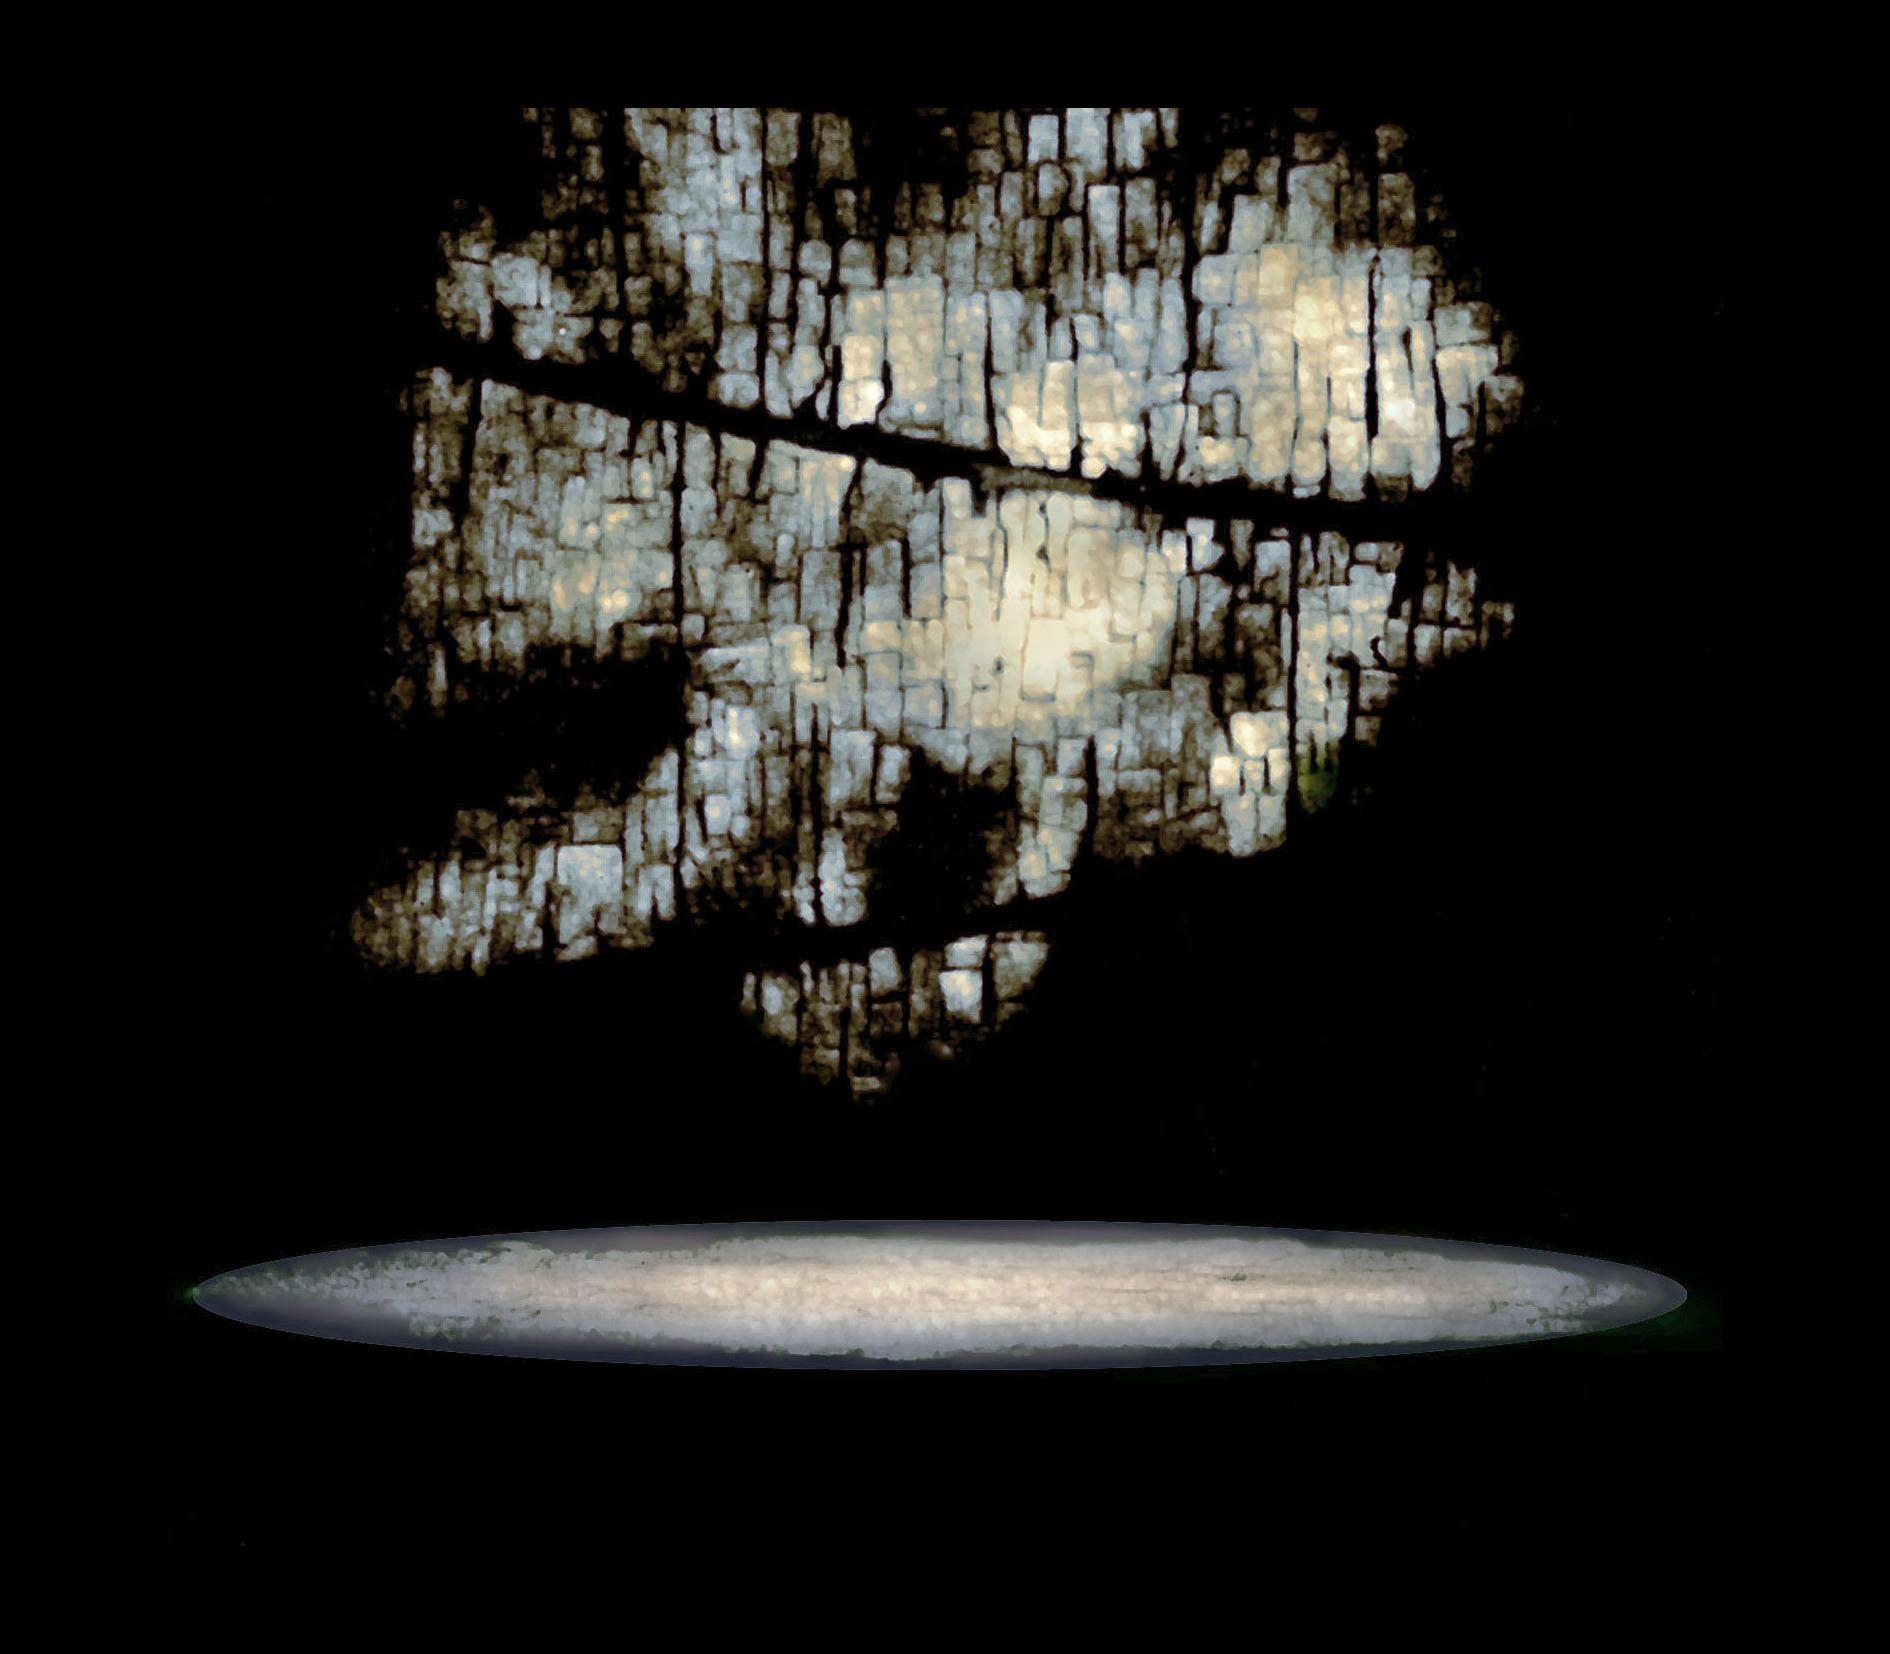 77 Bayreuth Ring 1965-1969 ideas | bayreuth, richard wagner, opera